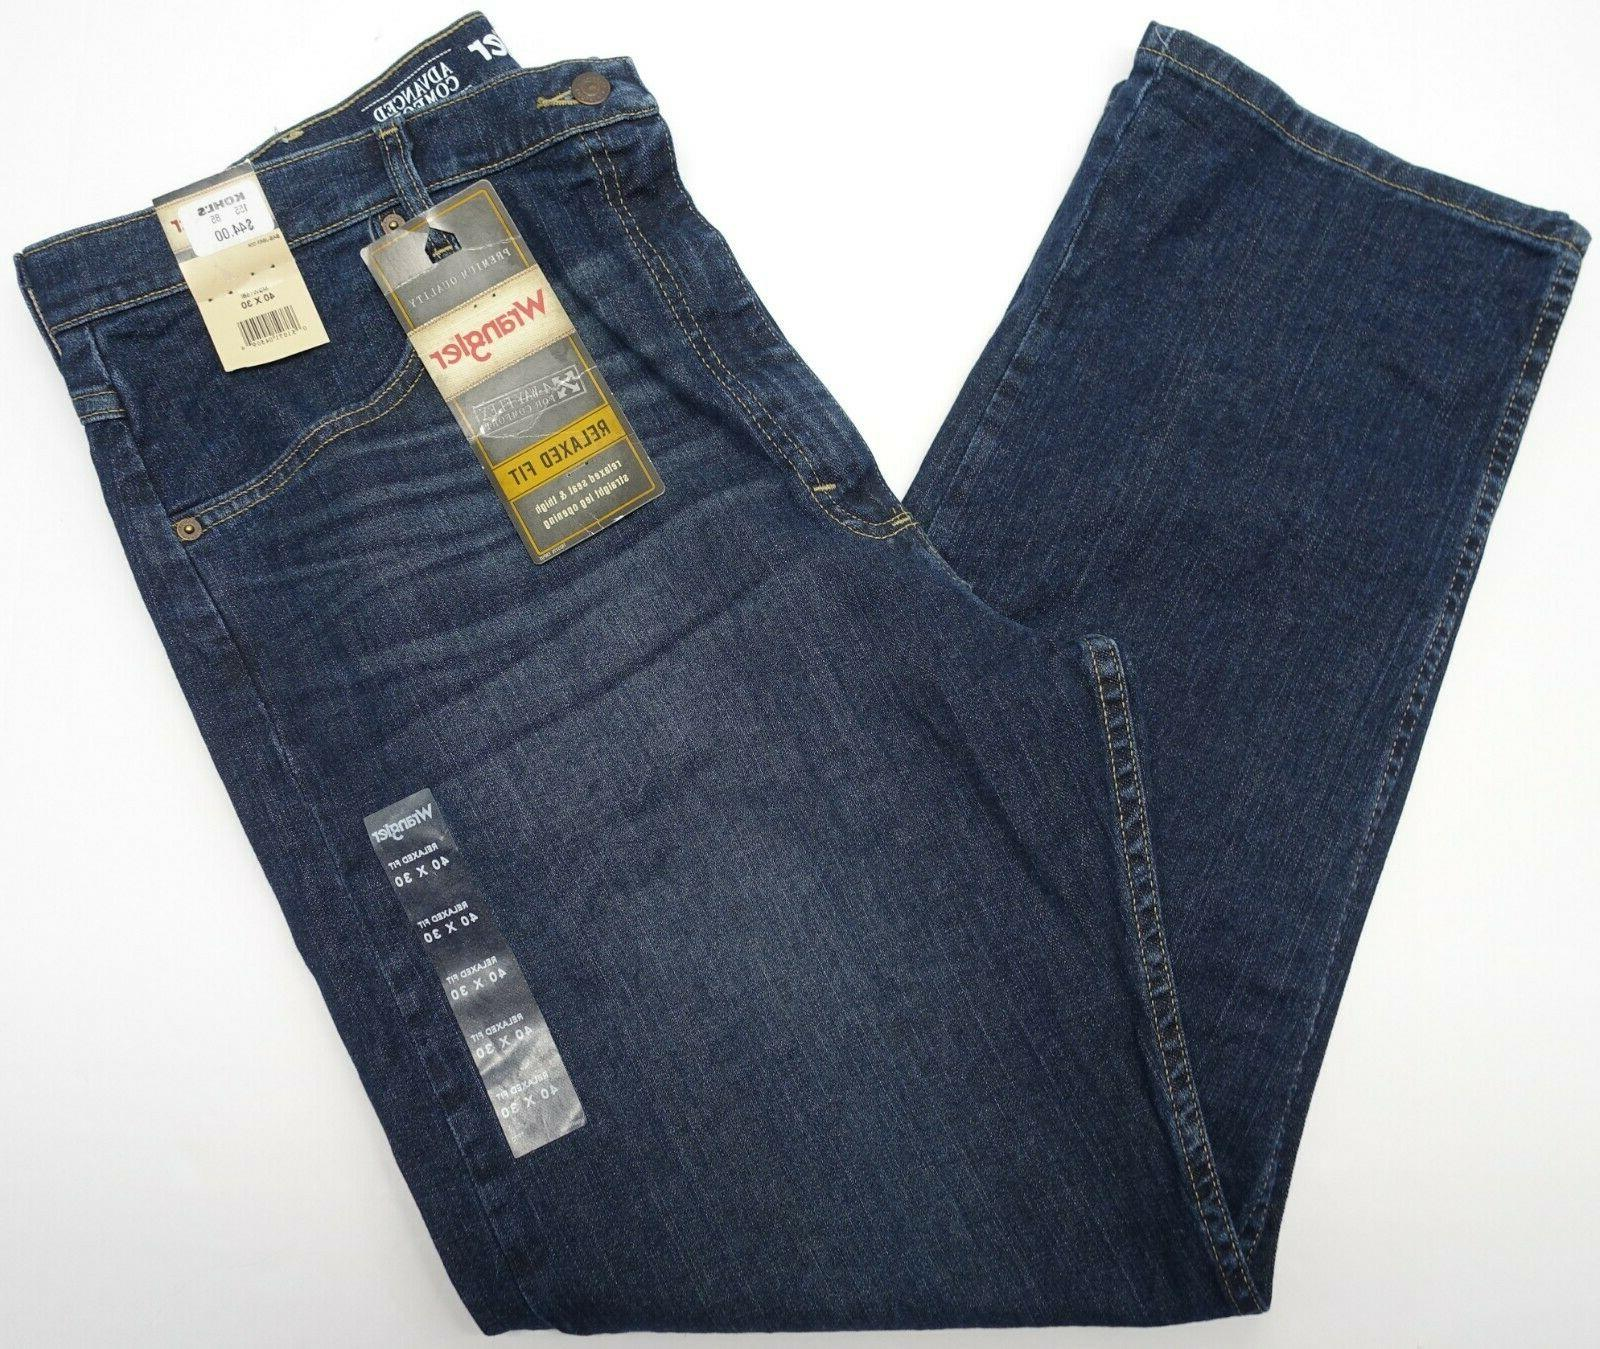 Mens Wrangler Jeans 40x30 Relaxed Fit 4-Way Flex Comfort Str